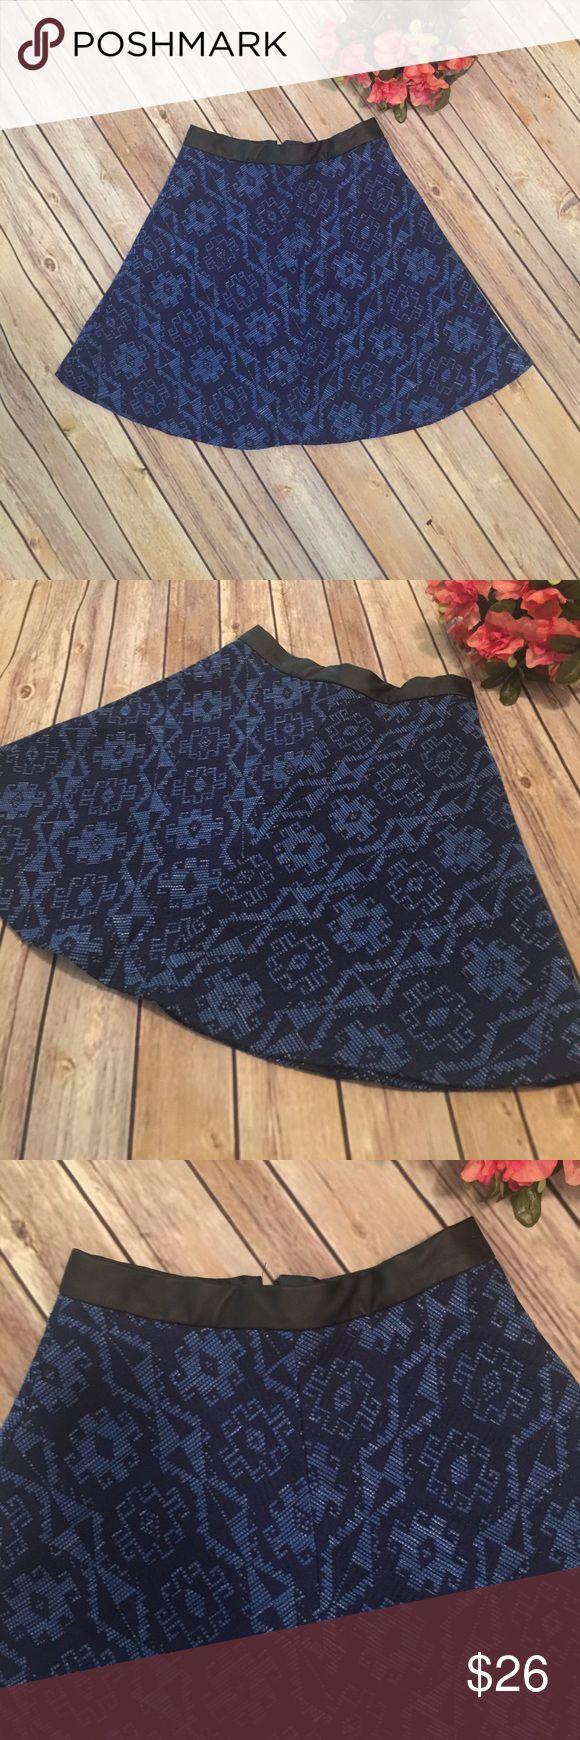 "Blue Zara Tribal Print Skirt Blue Zara Tribal Print Skirt.  In excellent condition!  Waist 24"" Length 17"" Zara Skirts Mini"